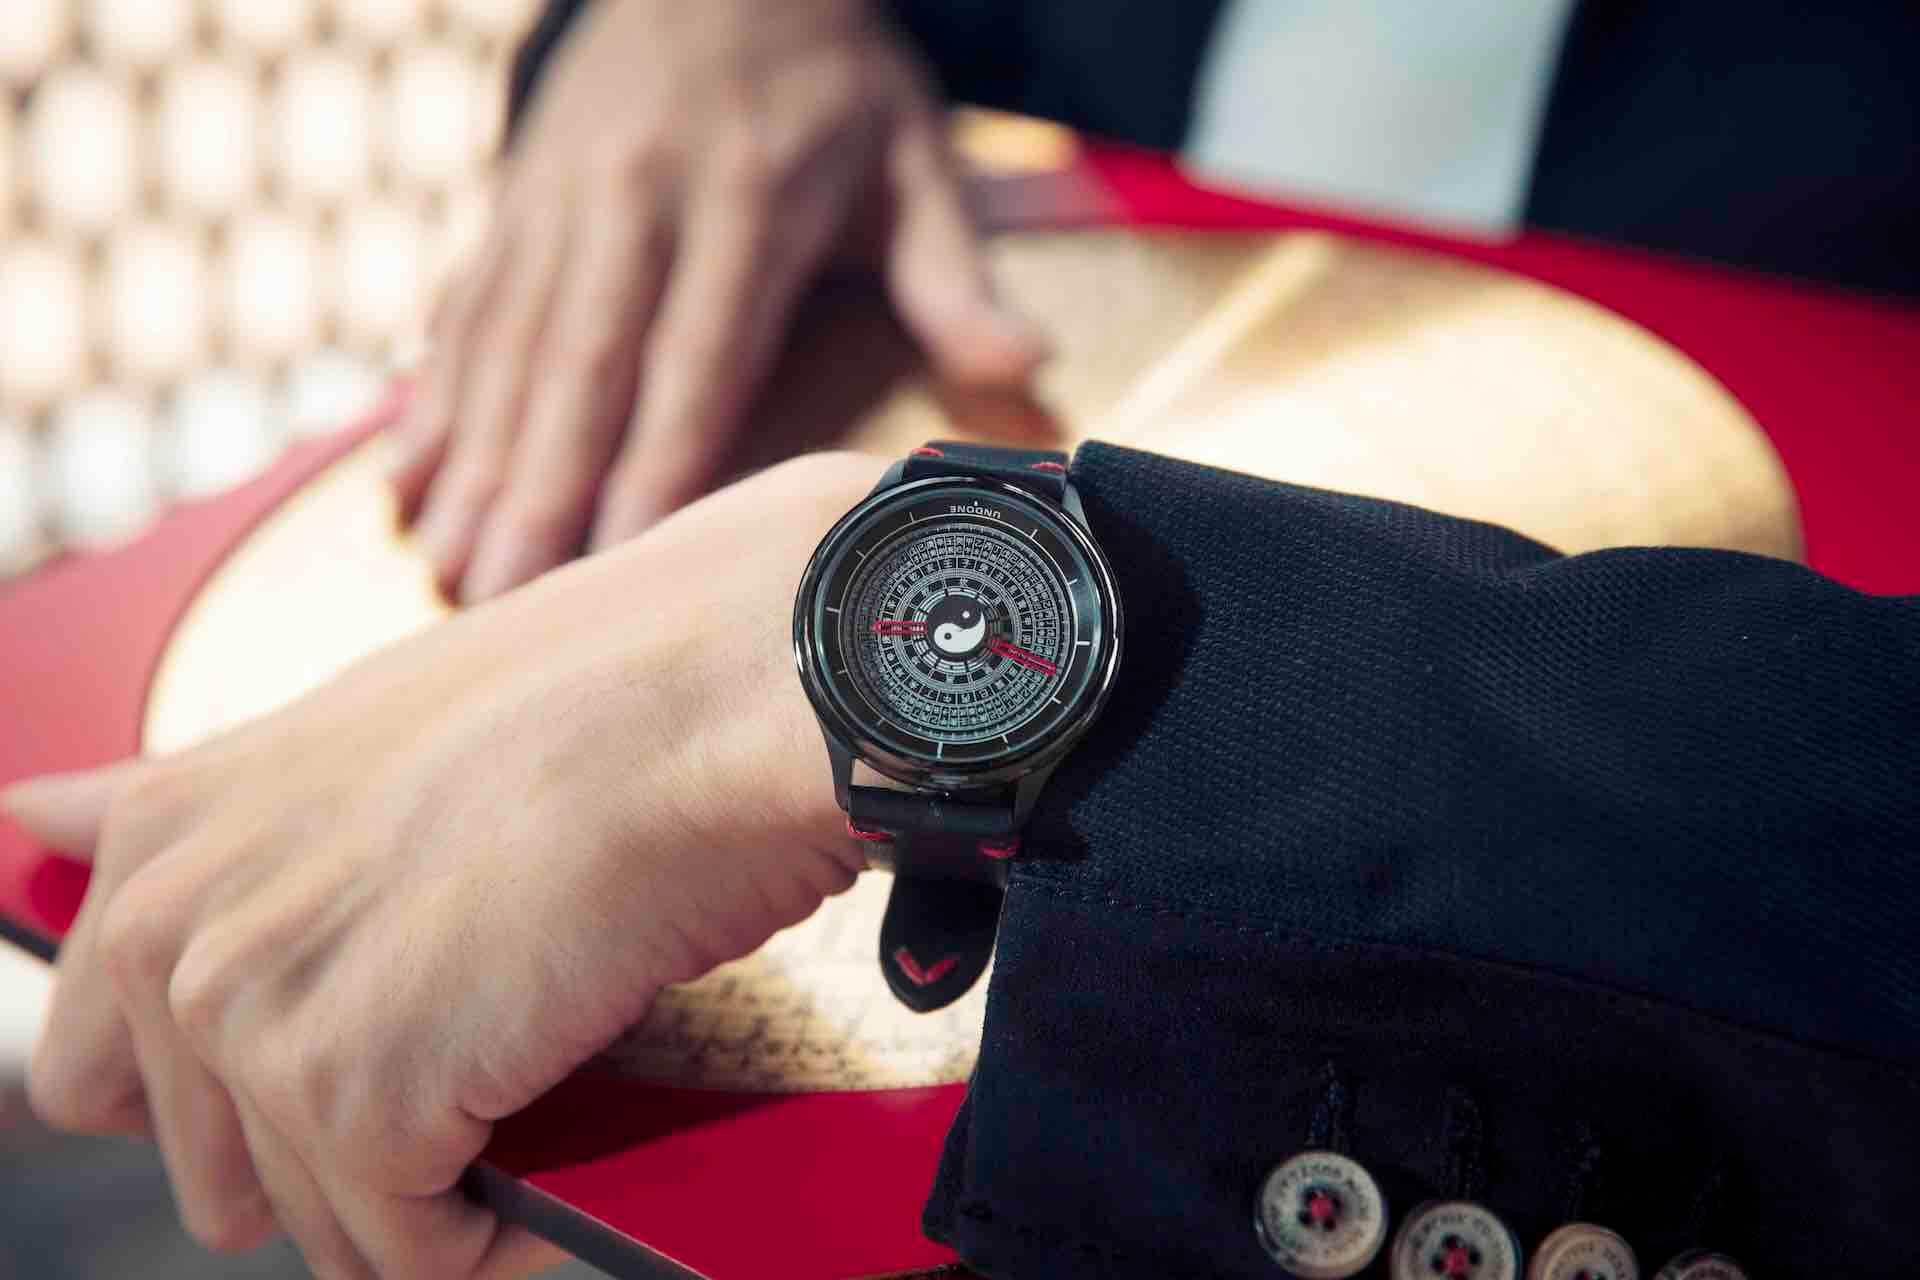 UNDONEから羅盤や風水コンパスを近代的にアレンジした腕時計が登場!ケースバックには十干十二支がプリント lf200623_undone_zen_07